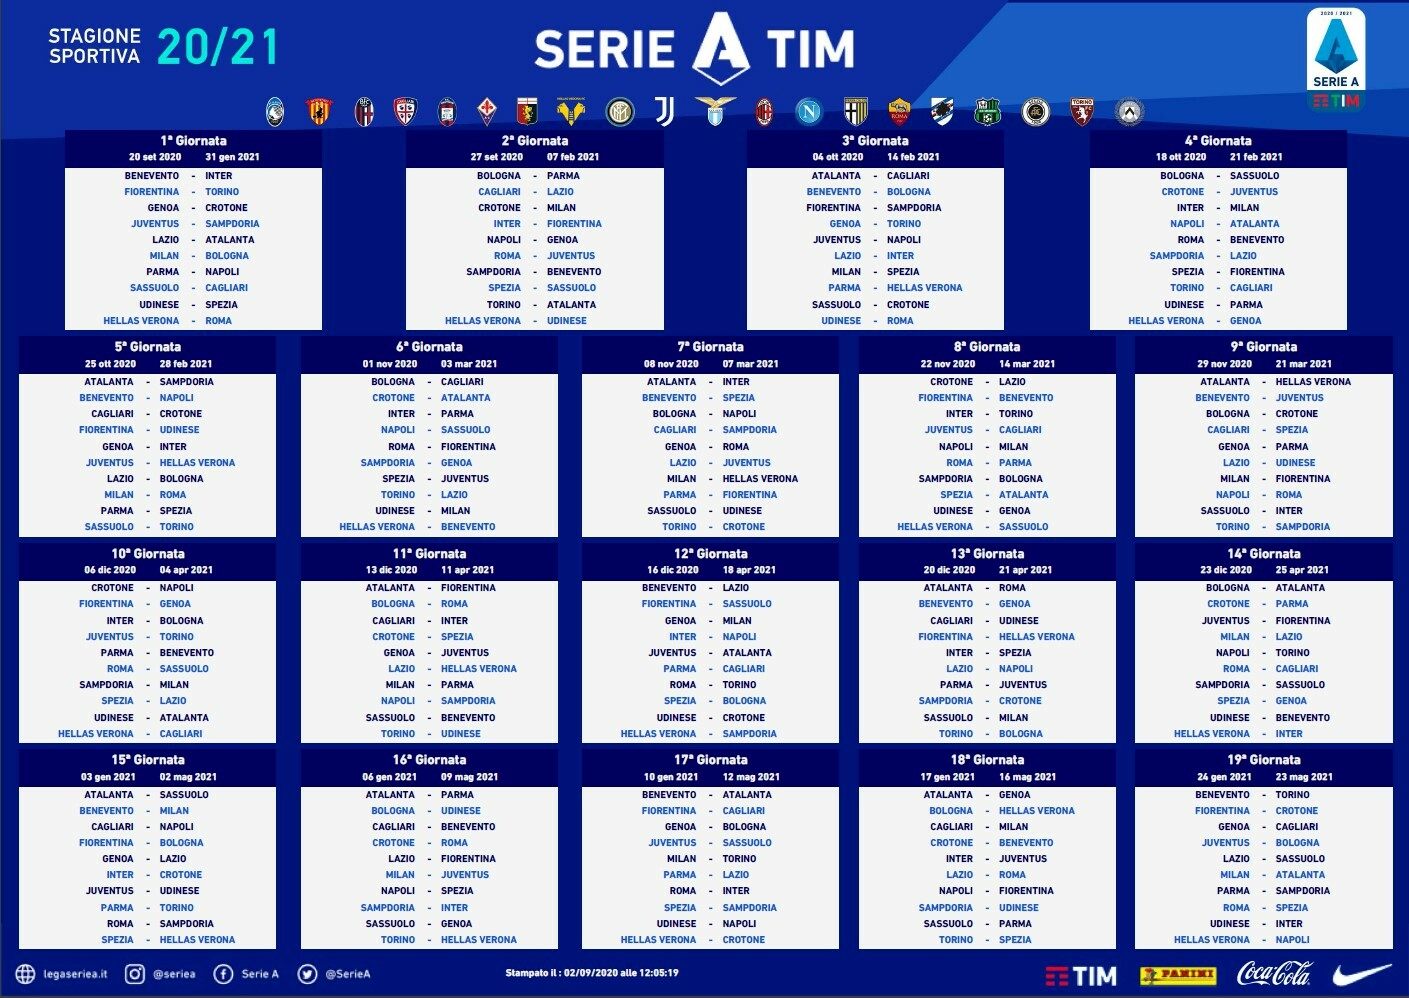 Calcio, il calendario di Serie A 2020/2021 | Hellas Verona